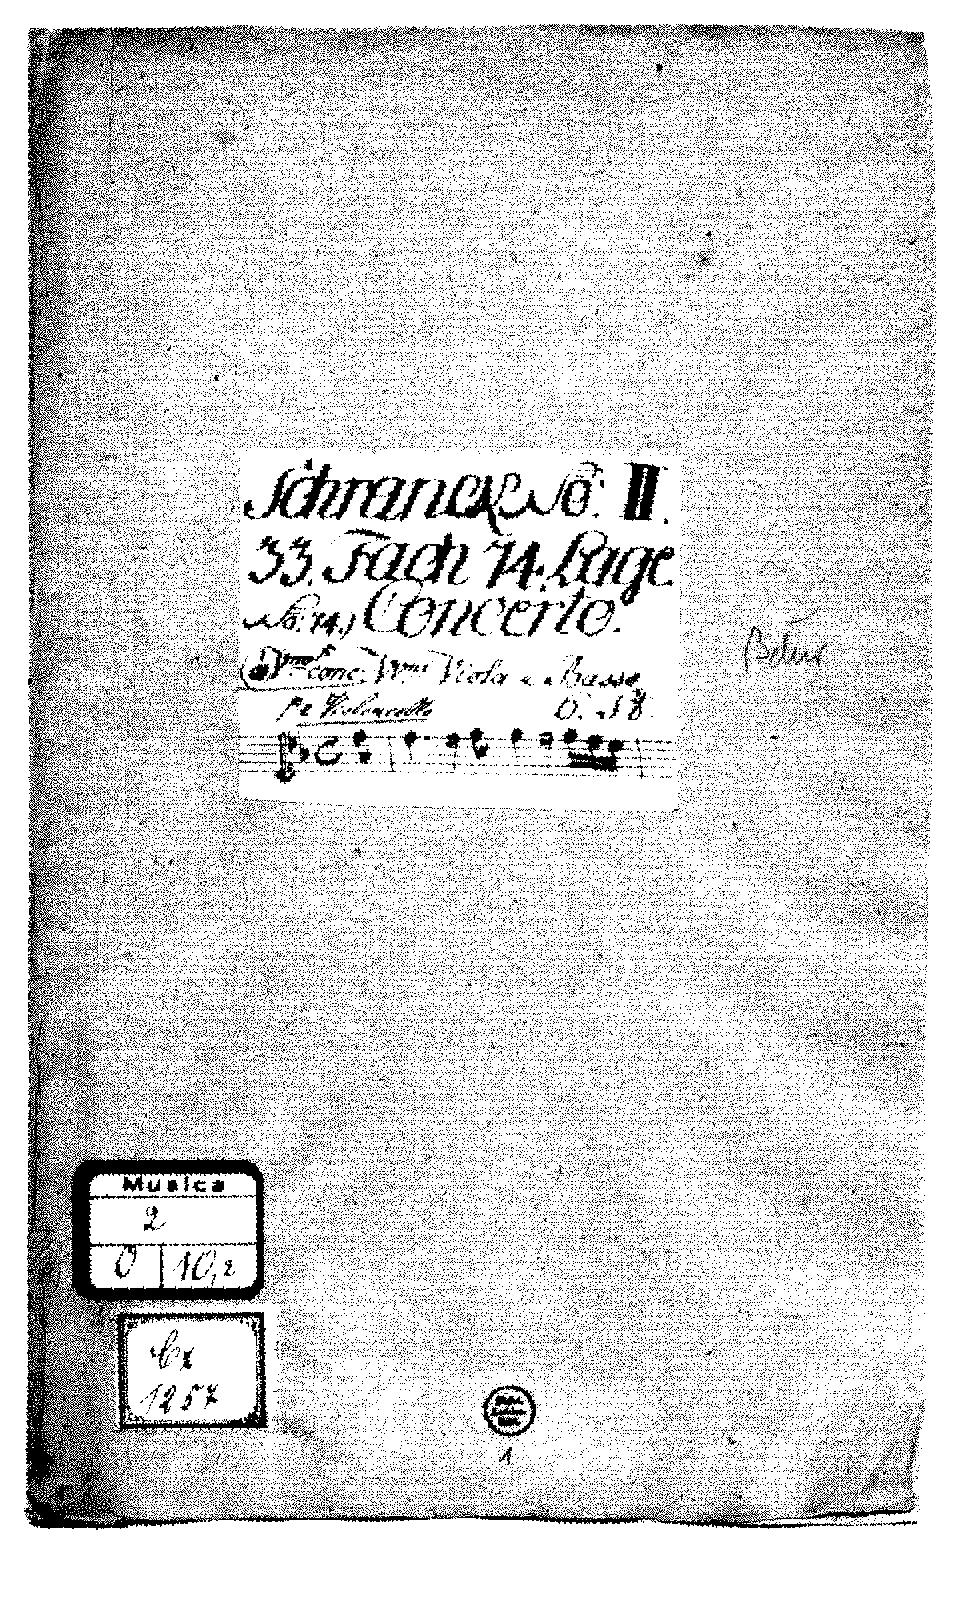 Concerto For Violin And Cello In B Flat Major Schrank II 33 74